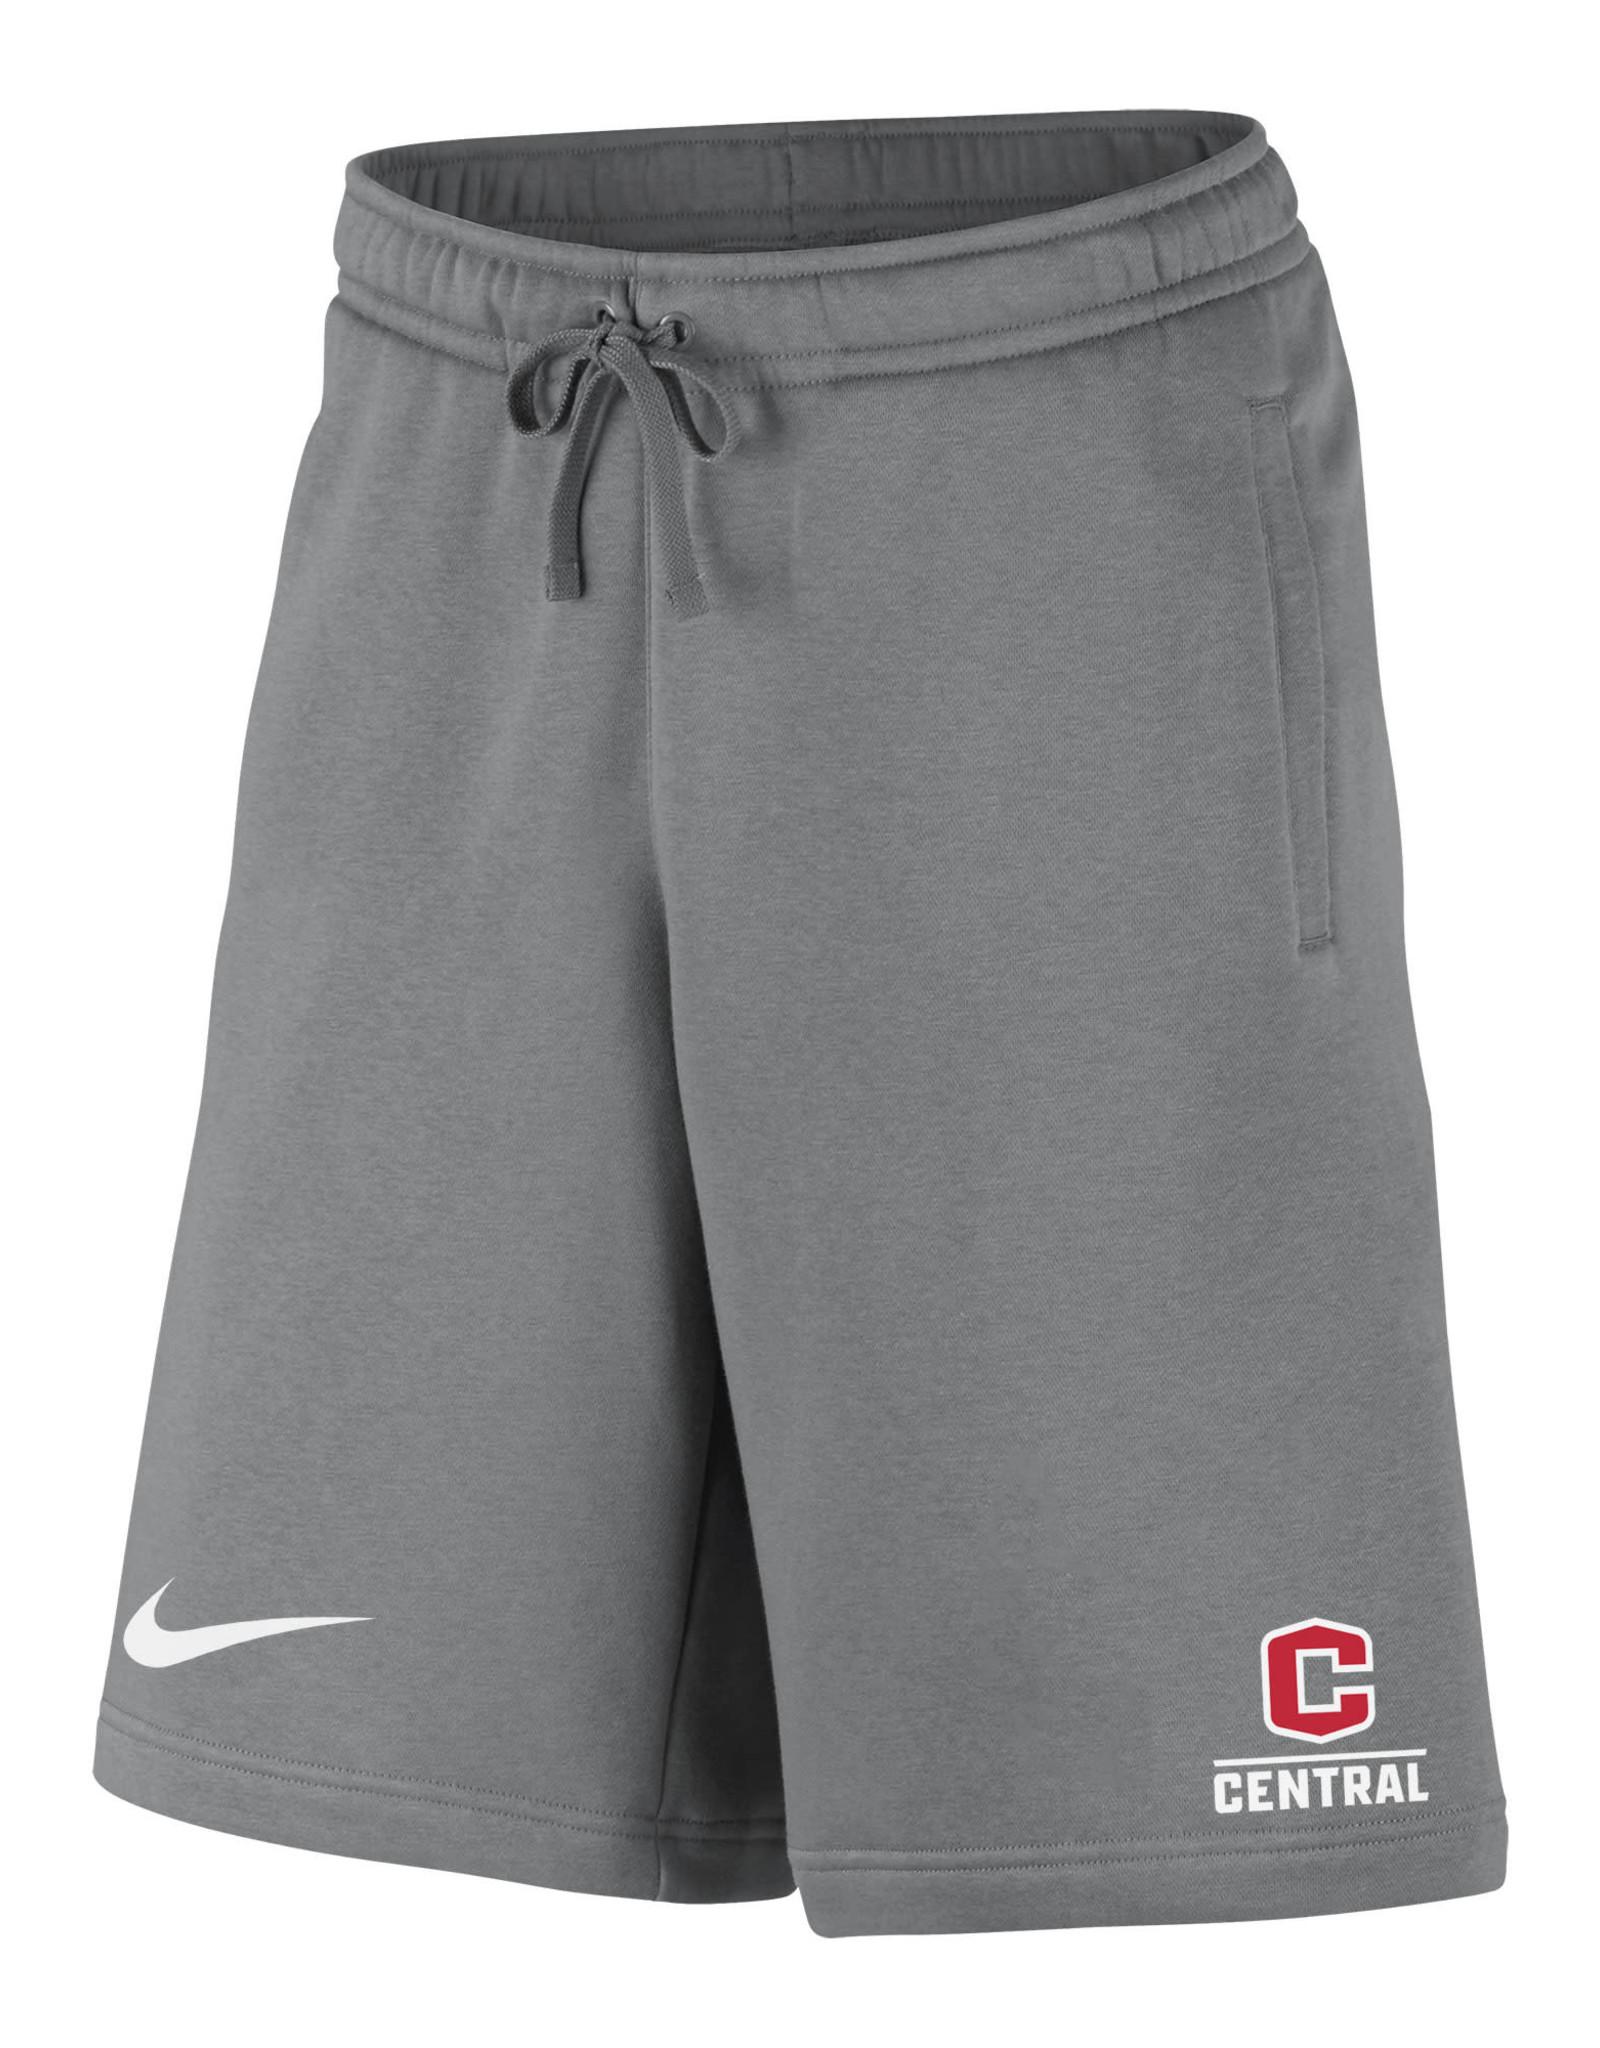 Nike Nike Men's Fleece Shorts Gray